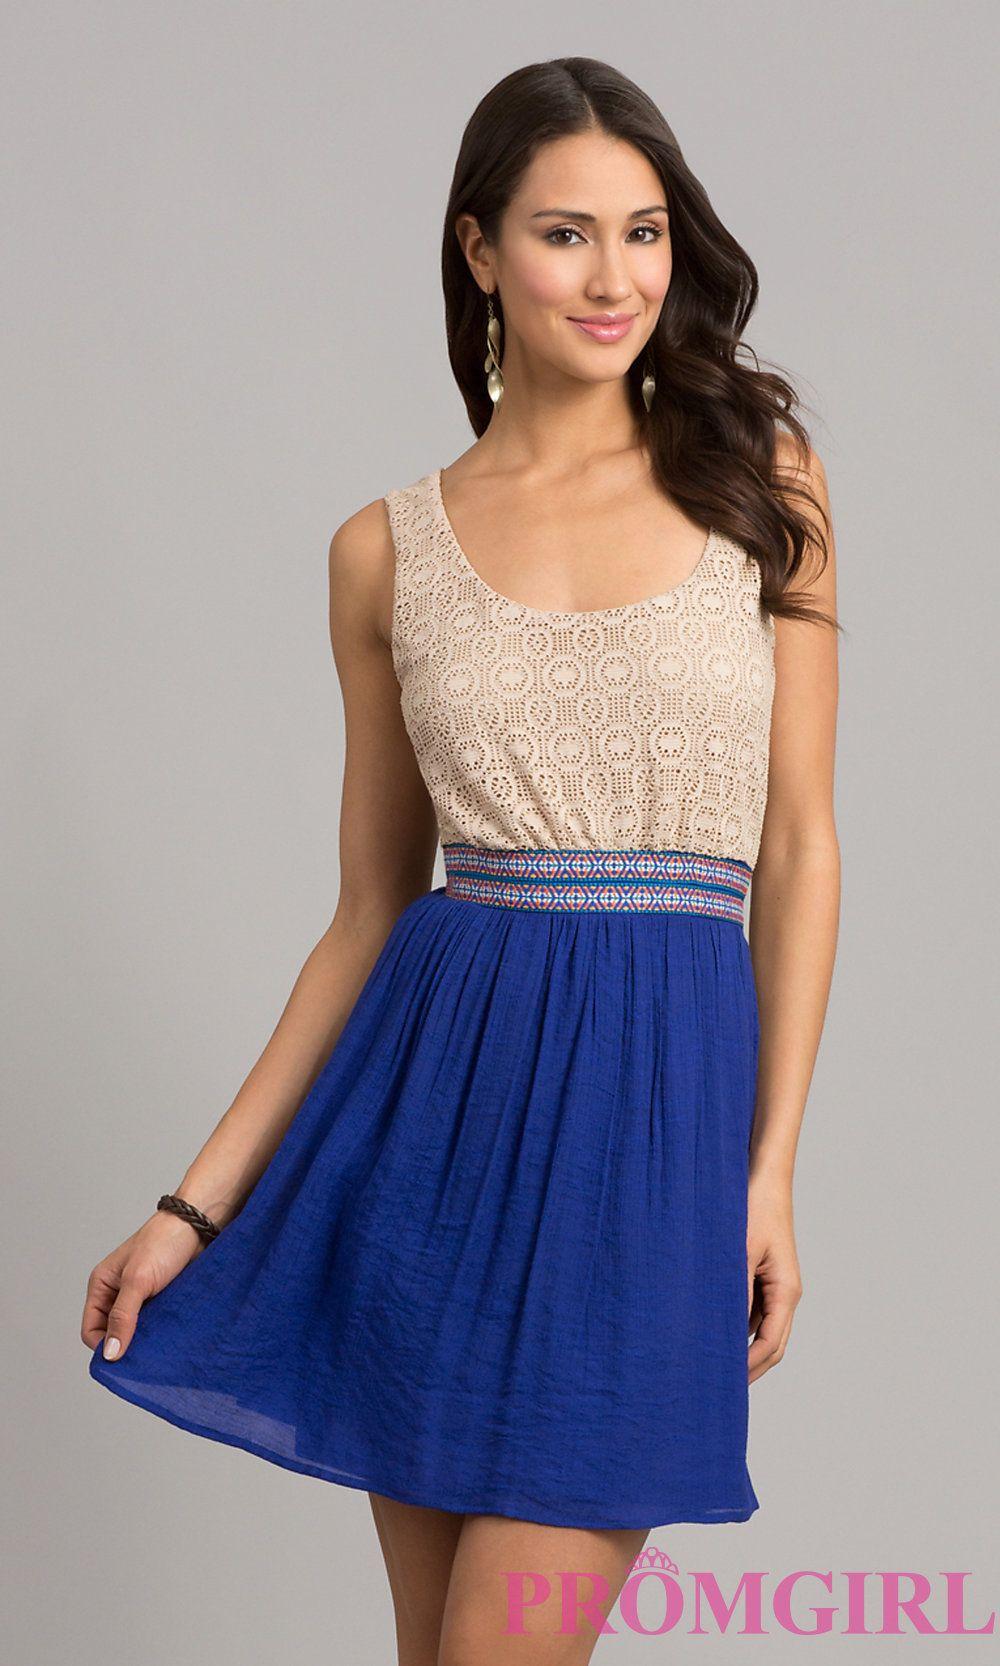 Short Sleeveless Casual Summer Dress- PromGirl